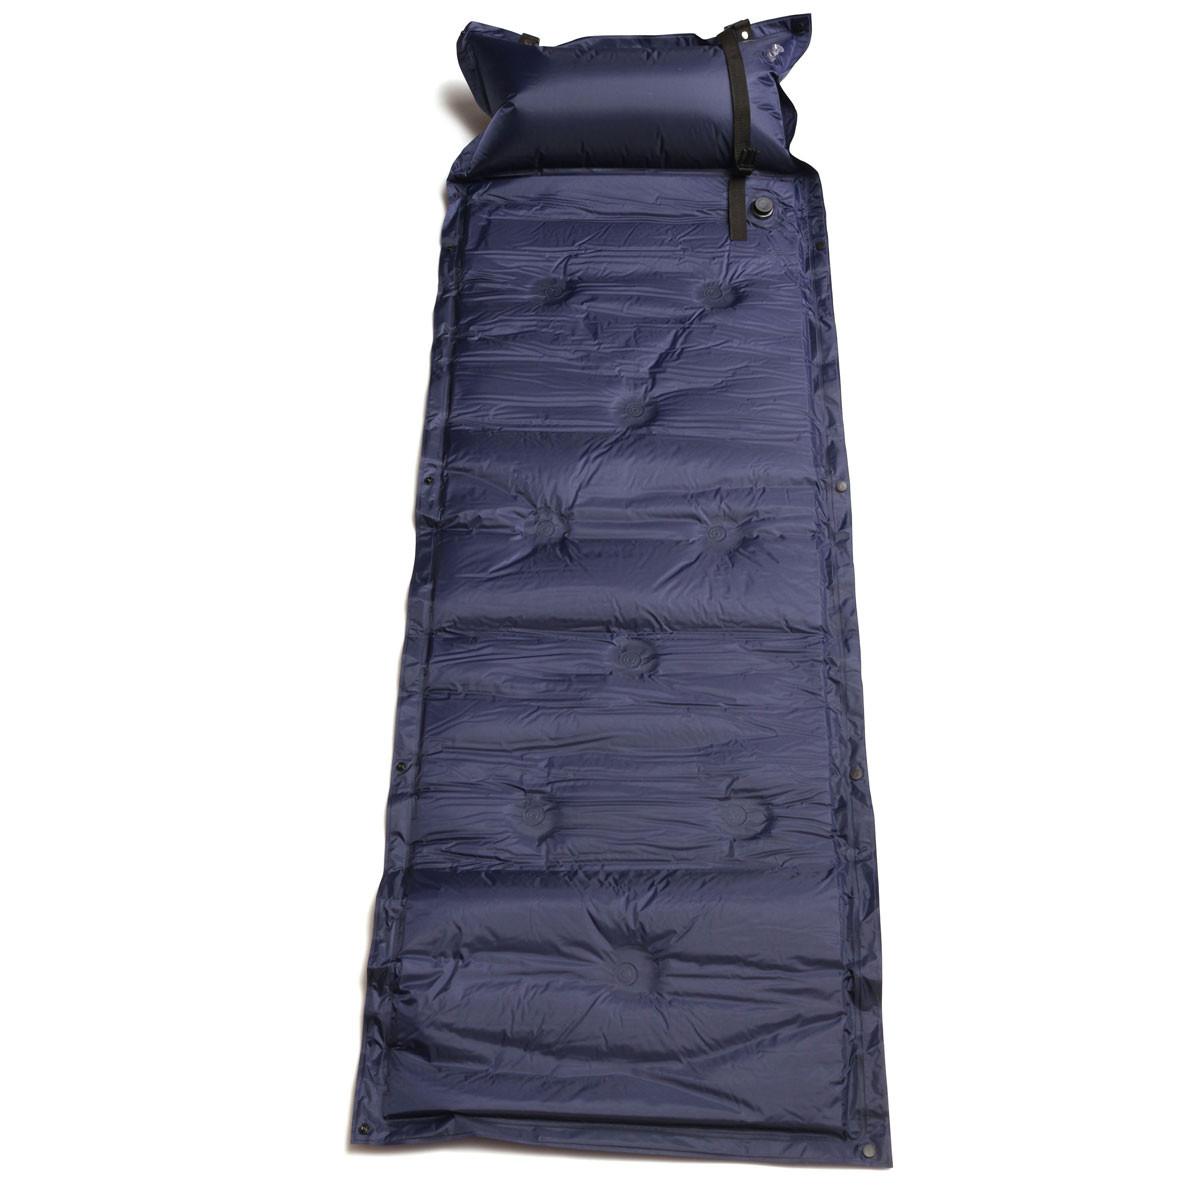 IPRee® 183x57x2.5cm Self Inflatable Air Mattress Camping ...